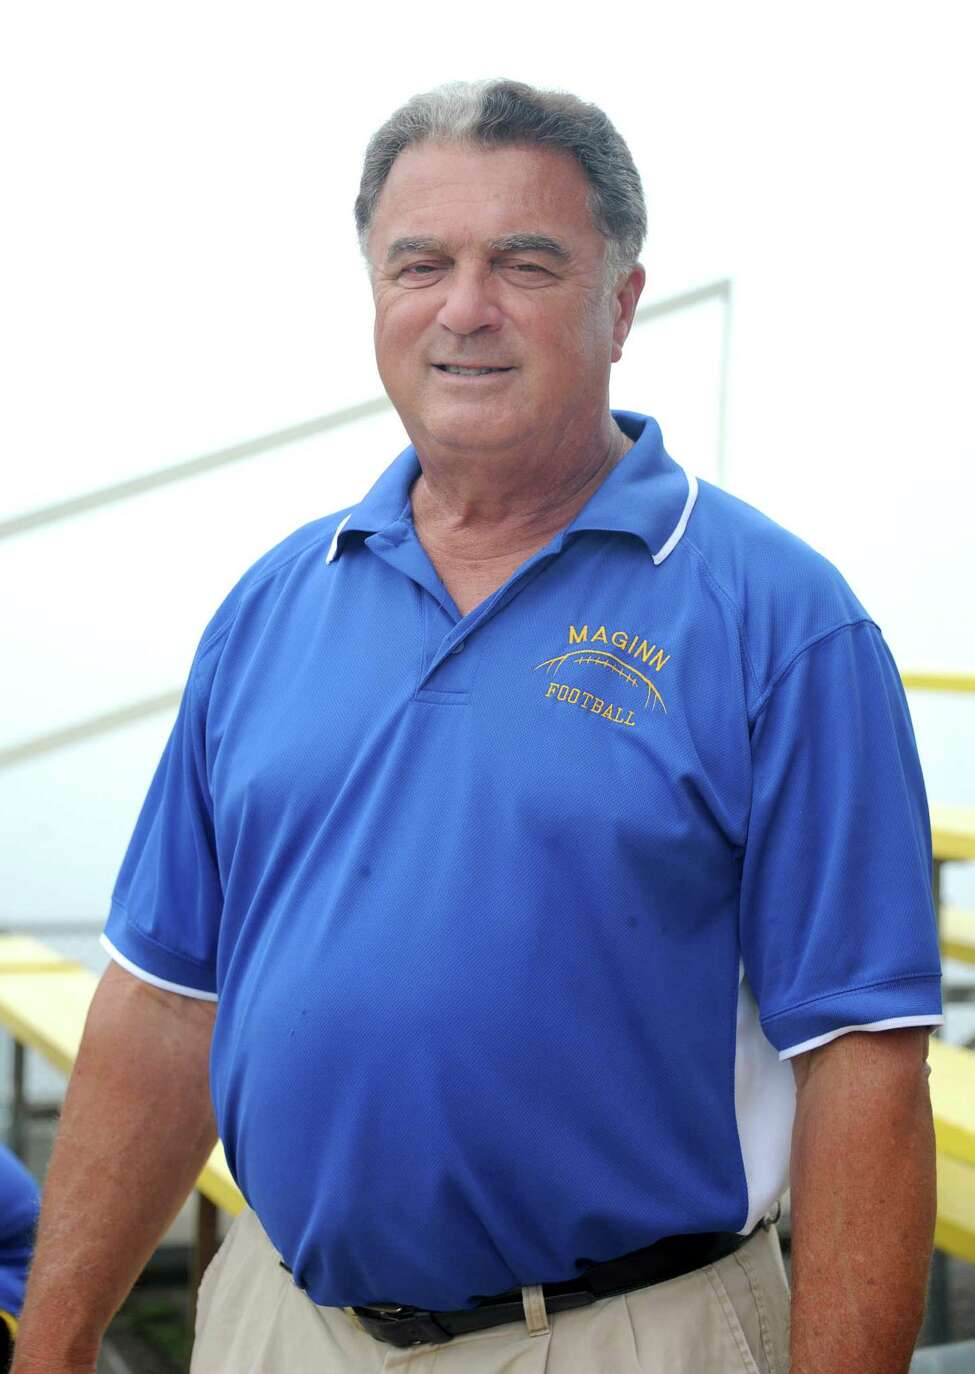 Bishop Maginn football coach Joe Grasso at section II football media day at UAlbany on Sunday, Sept. 1, 2013 in Albany, N.Y. (Lori Van Buren / Times Union)